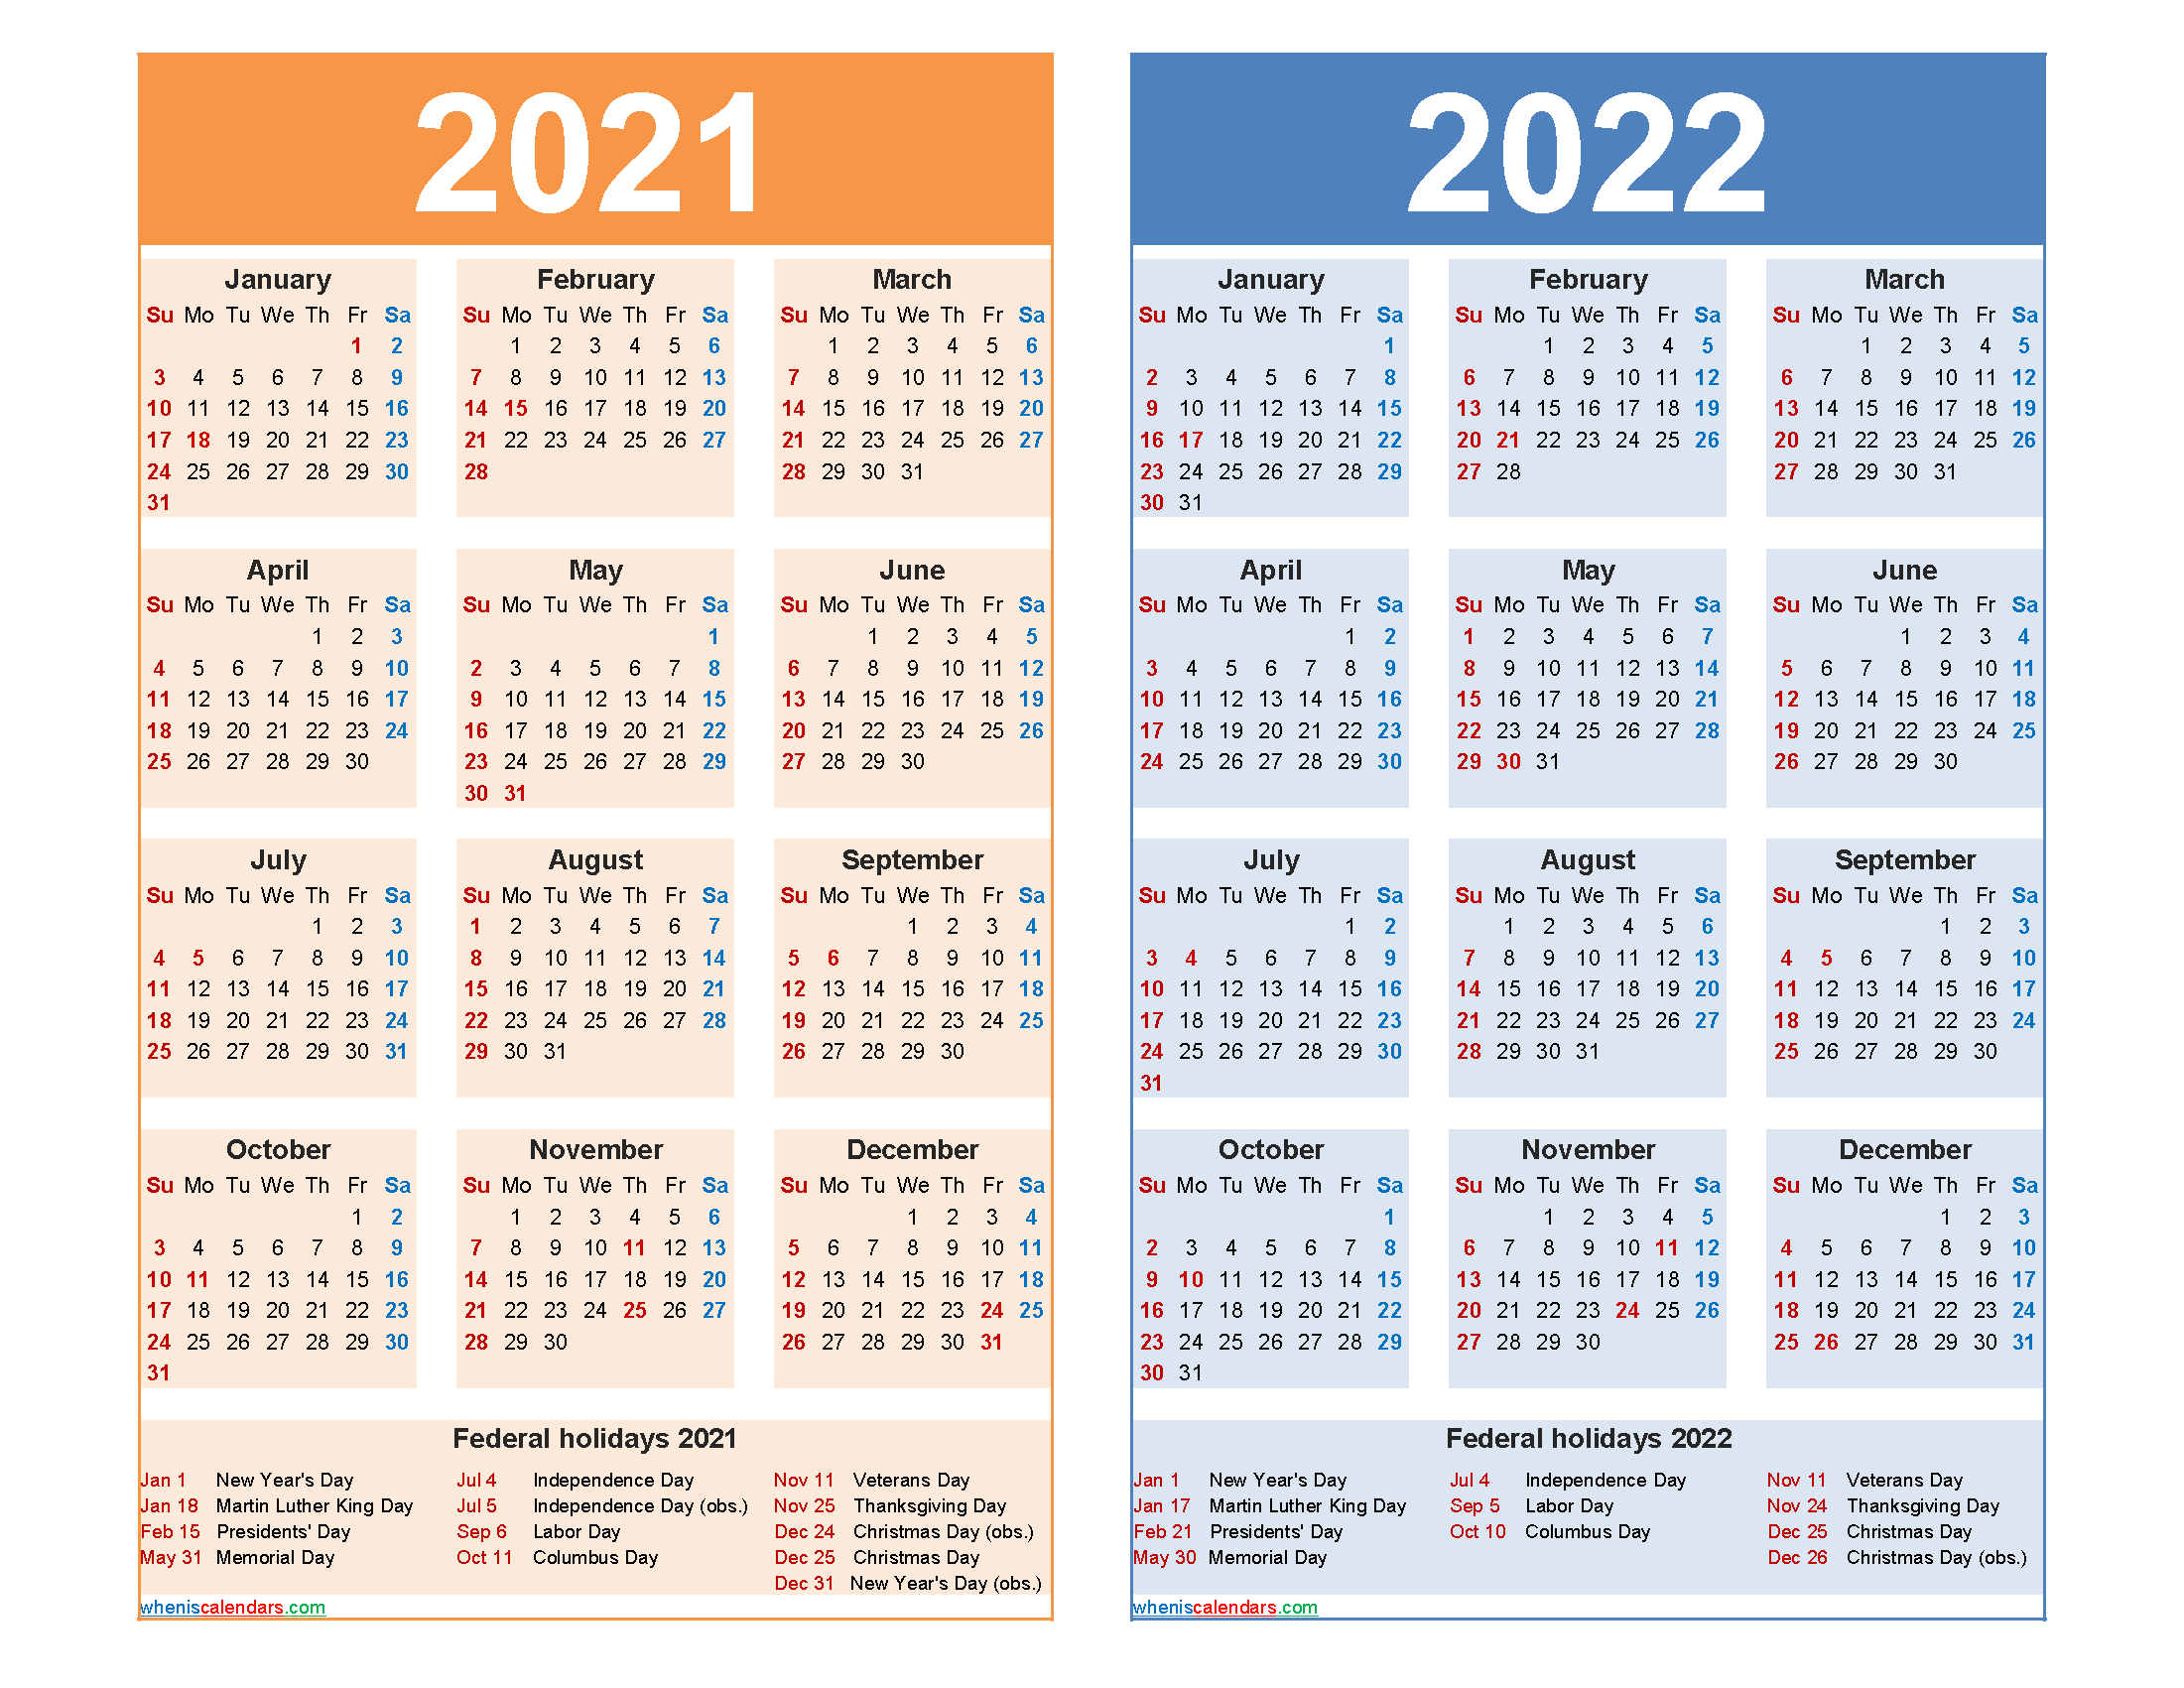 Free 2021 and 2022 Calendar Printable Word, PDF | Free ...